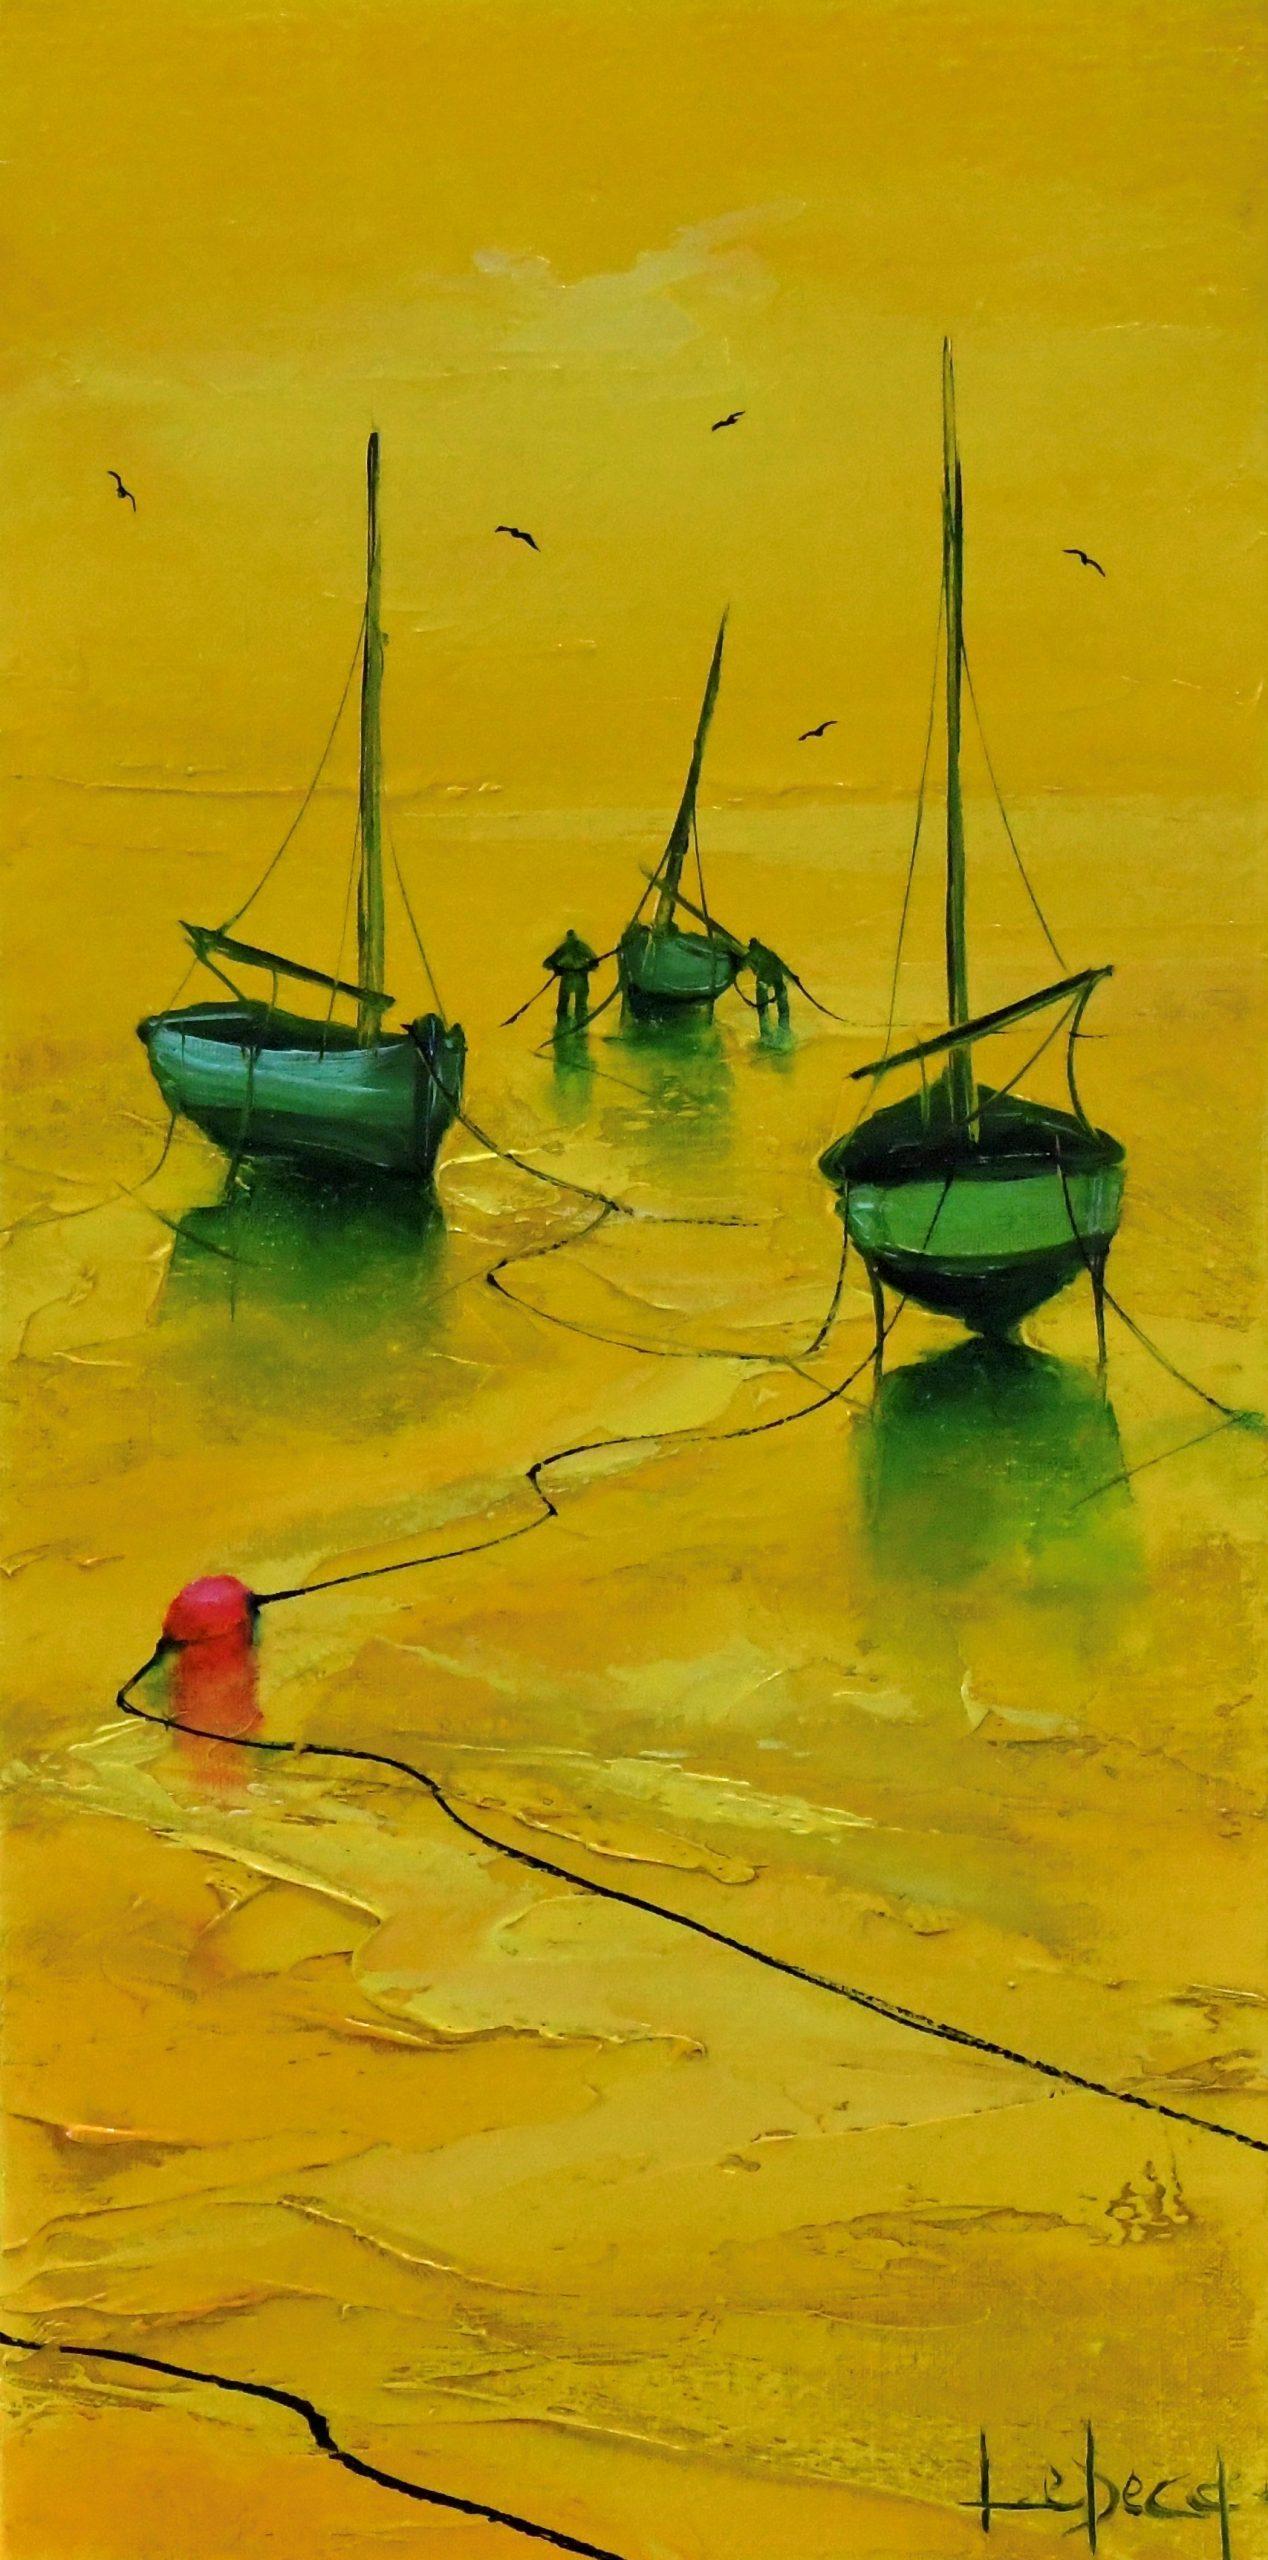 Denis Lebecq Artiste peintre pont-aven jaune